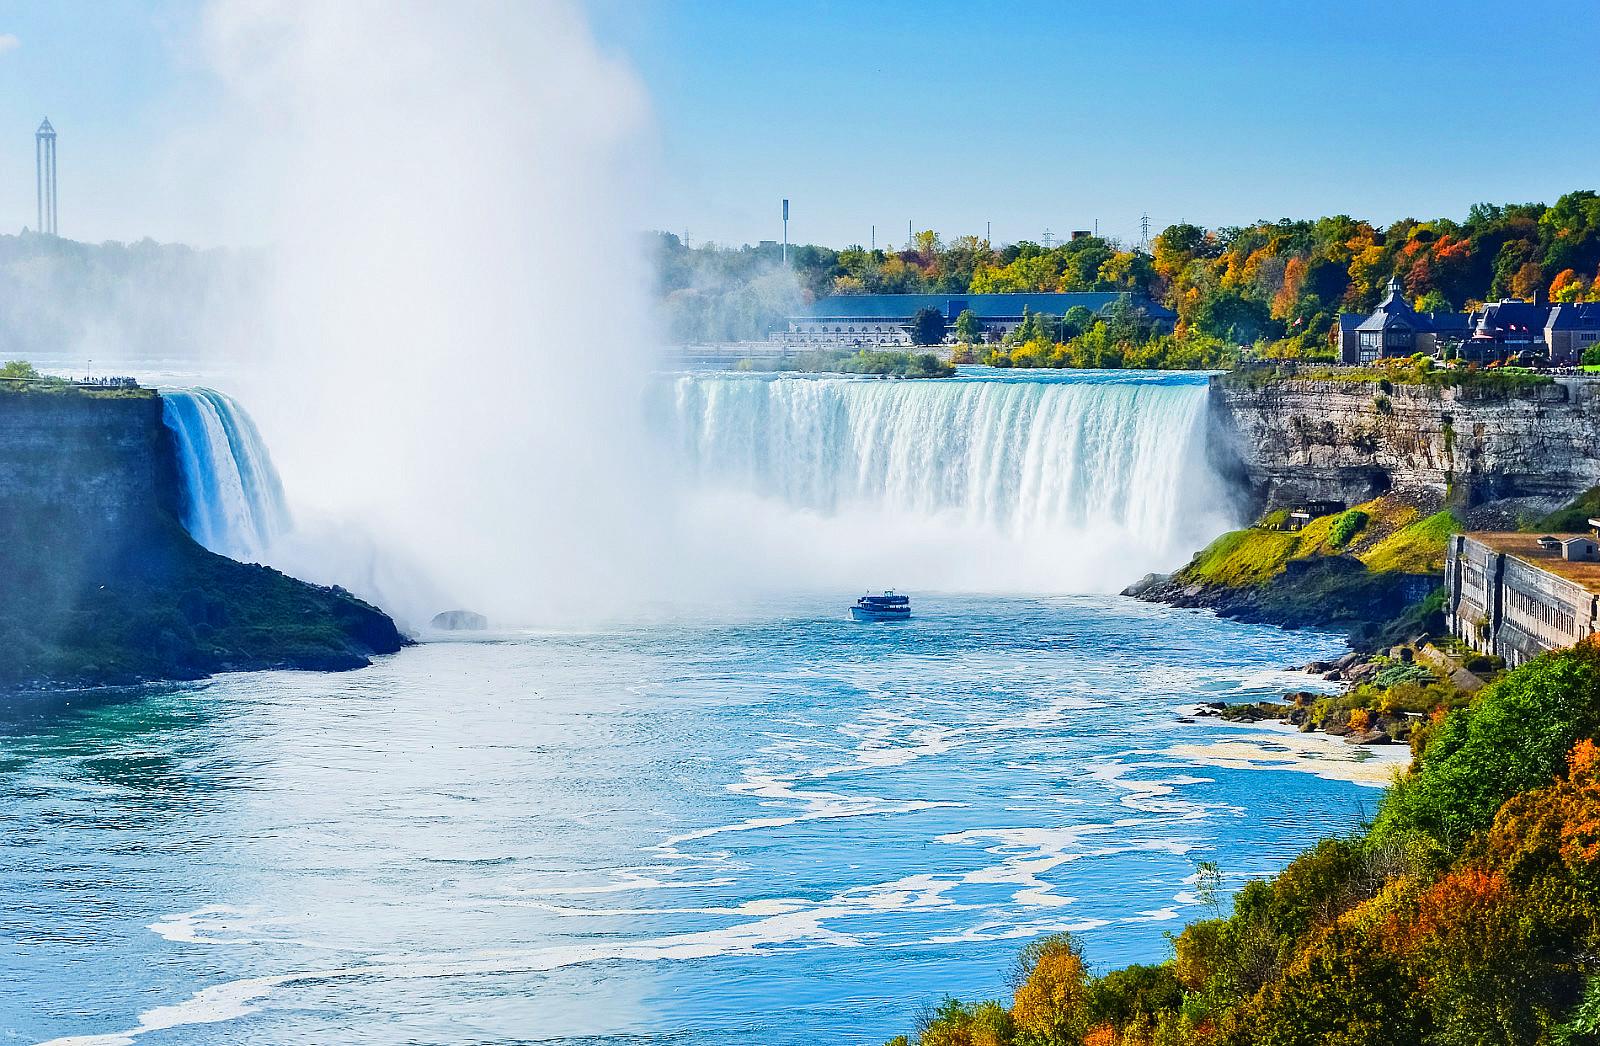 Bus Tour To Niagara Falls